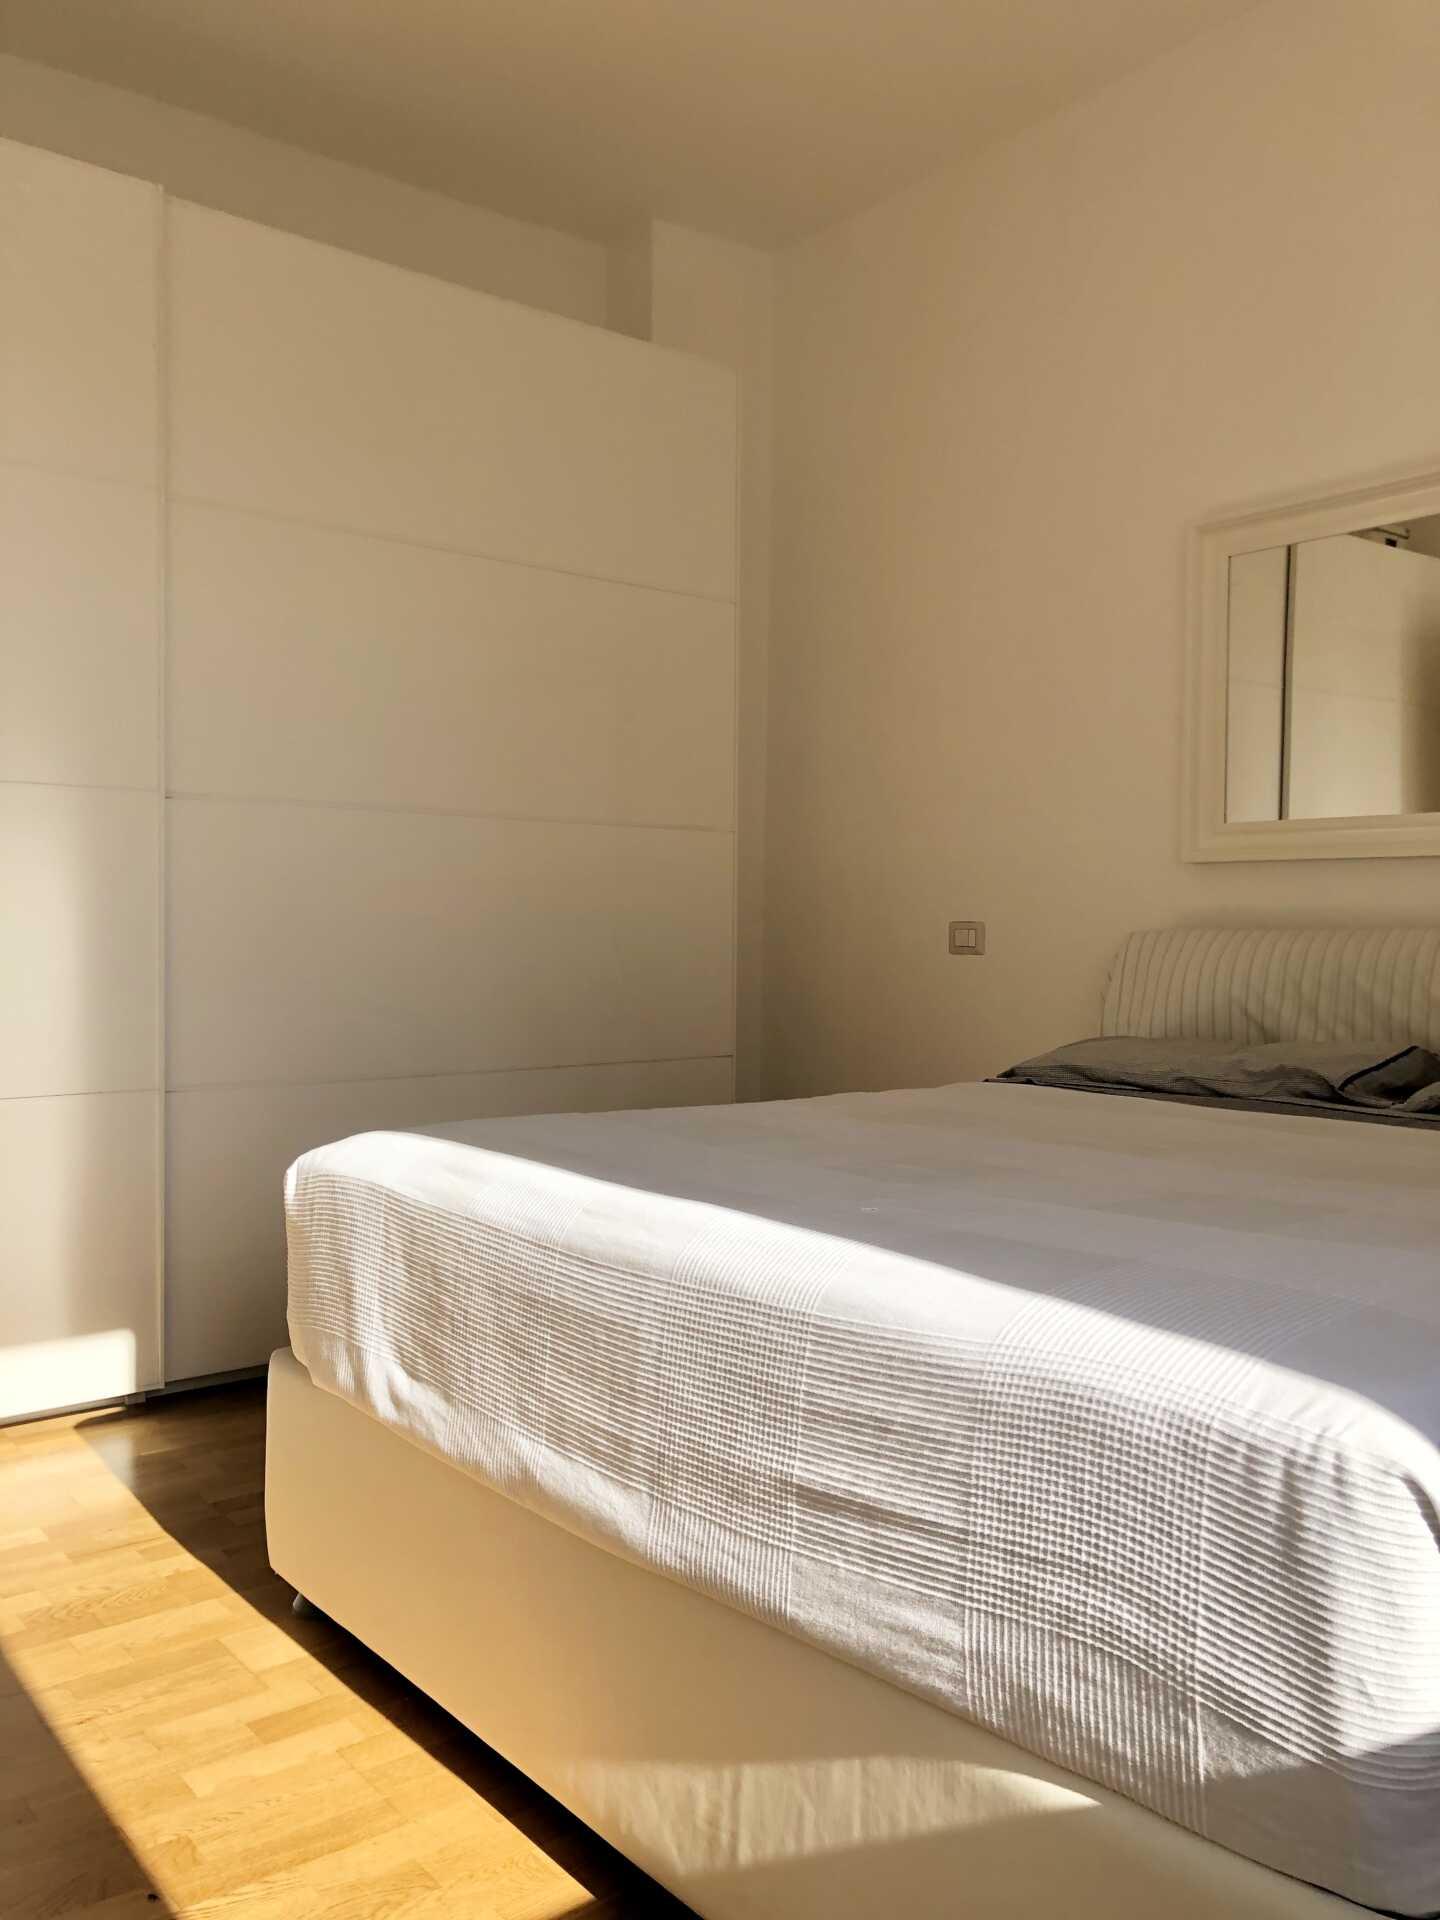 Case in vendita Milano Cermenate (26)